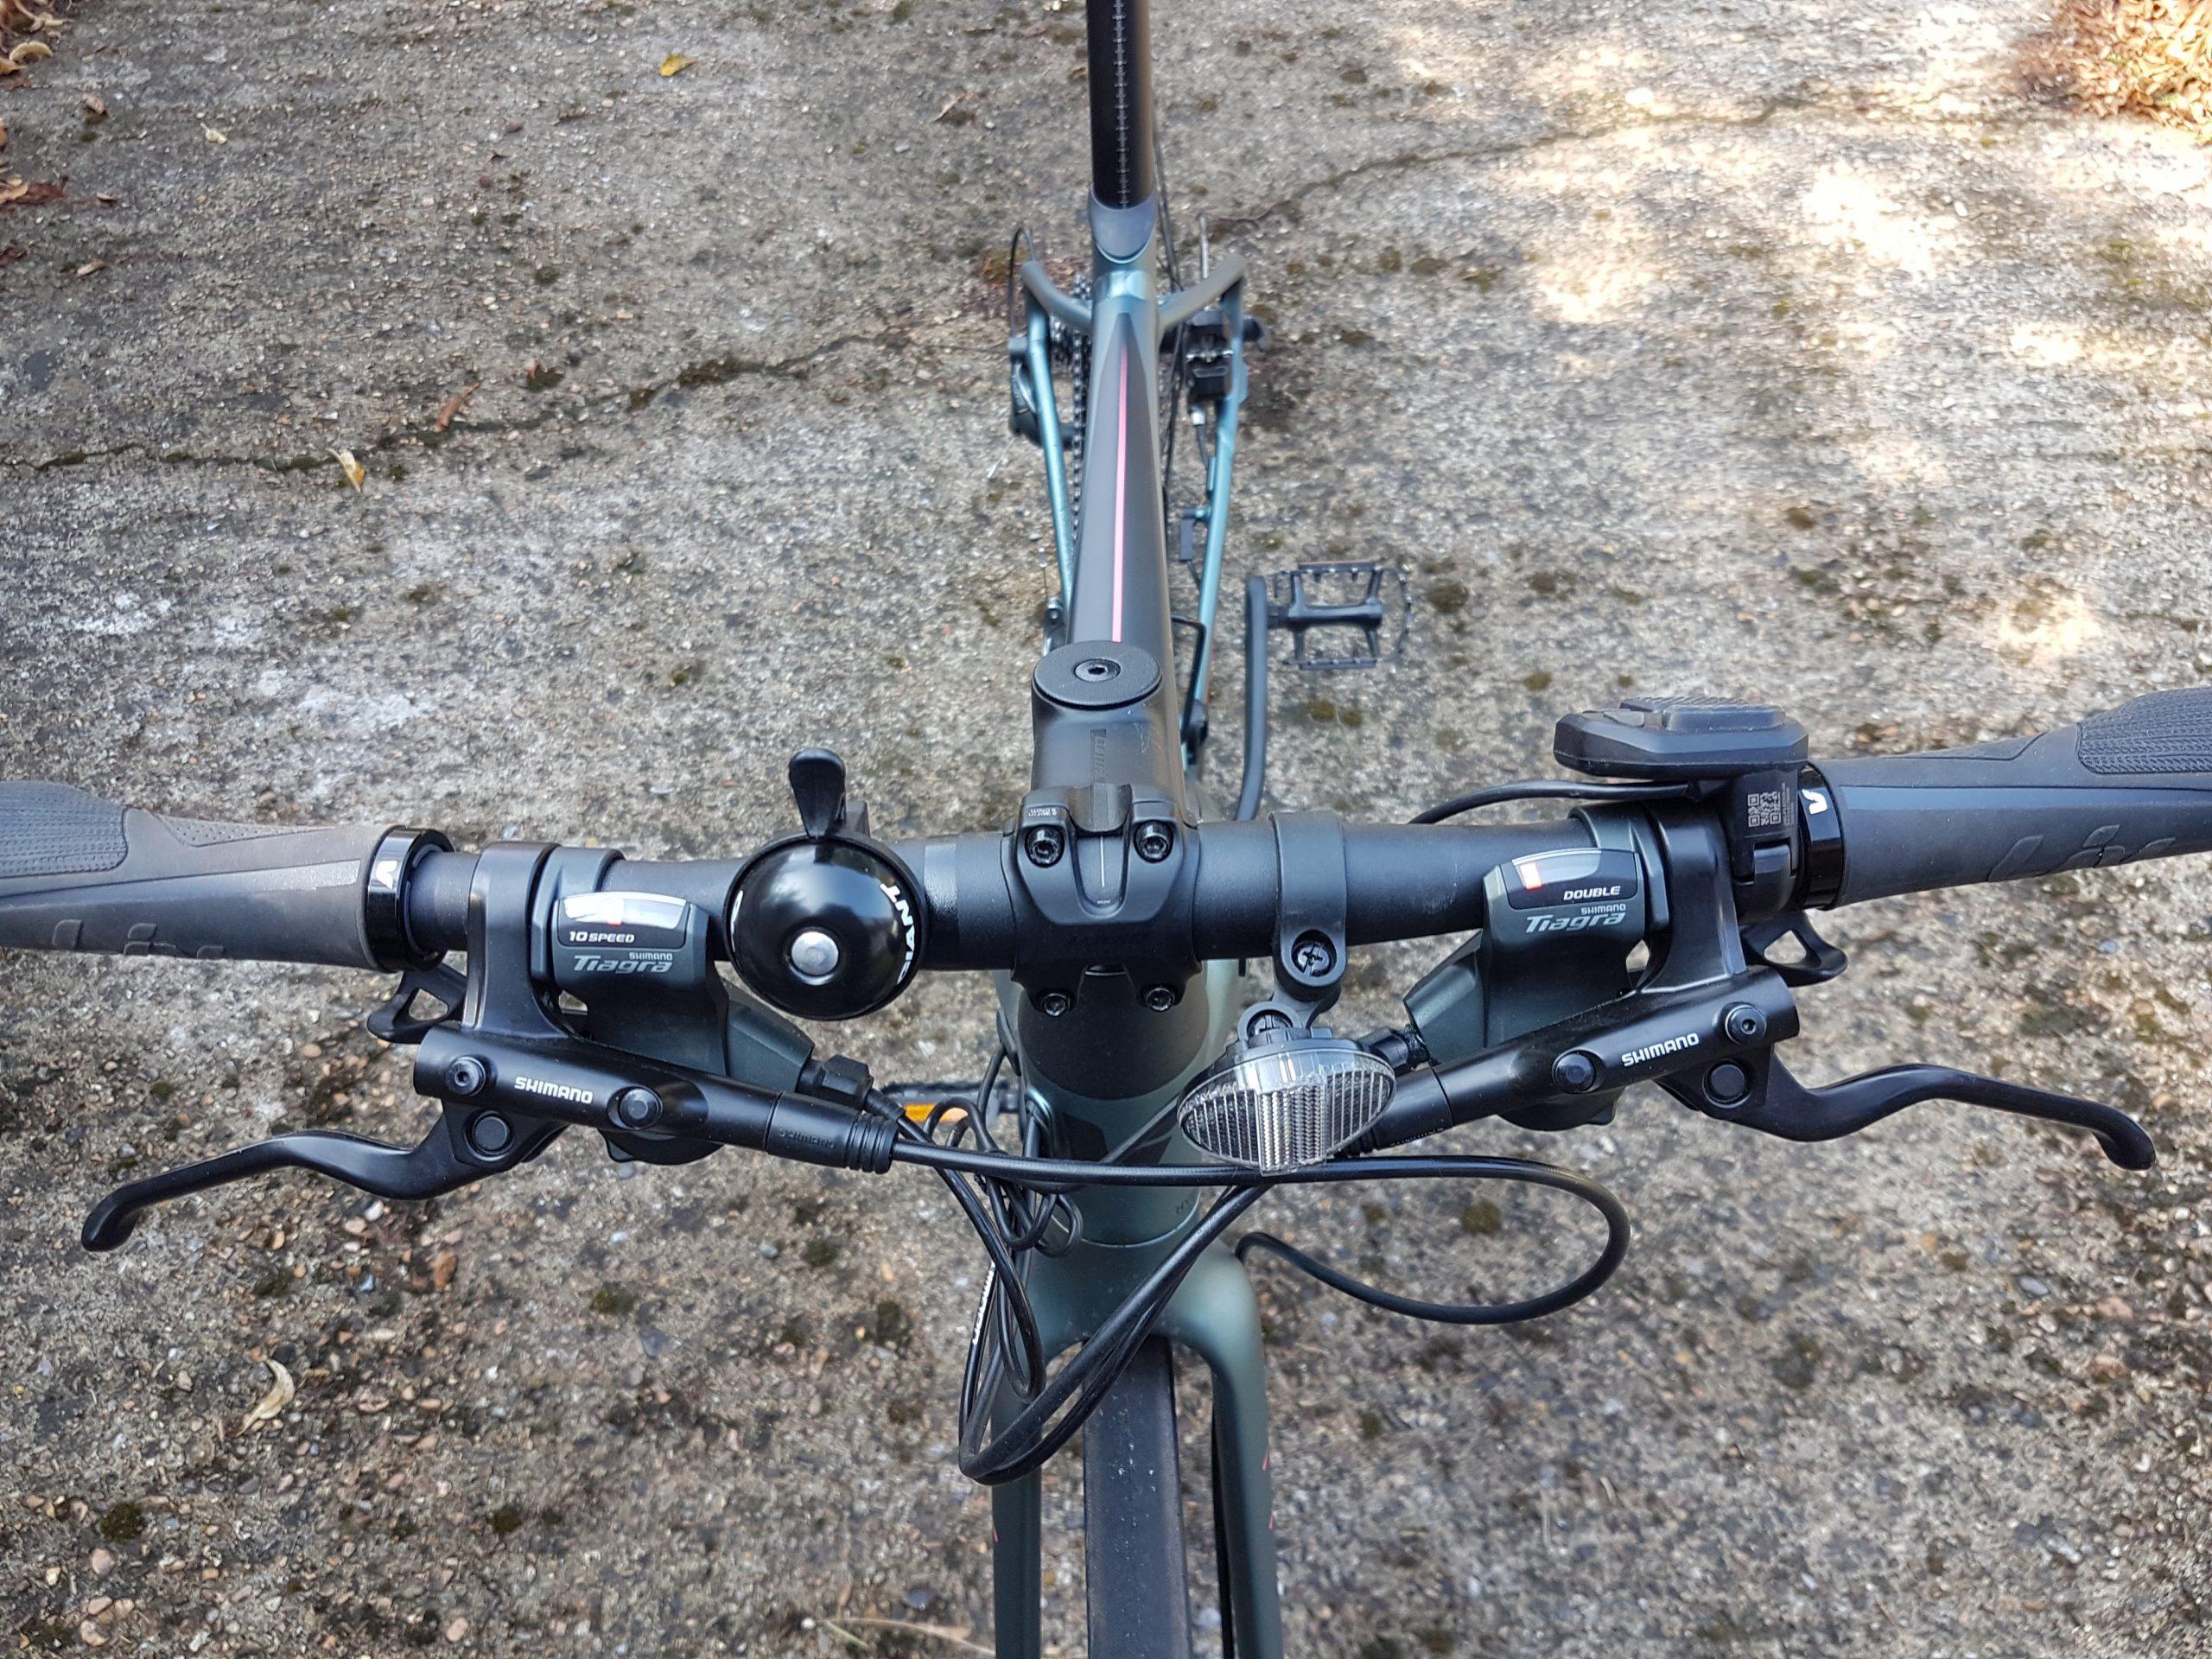 Liv Thrive E+ 2 Pro electric bike